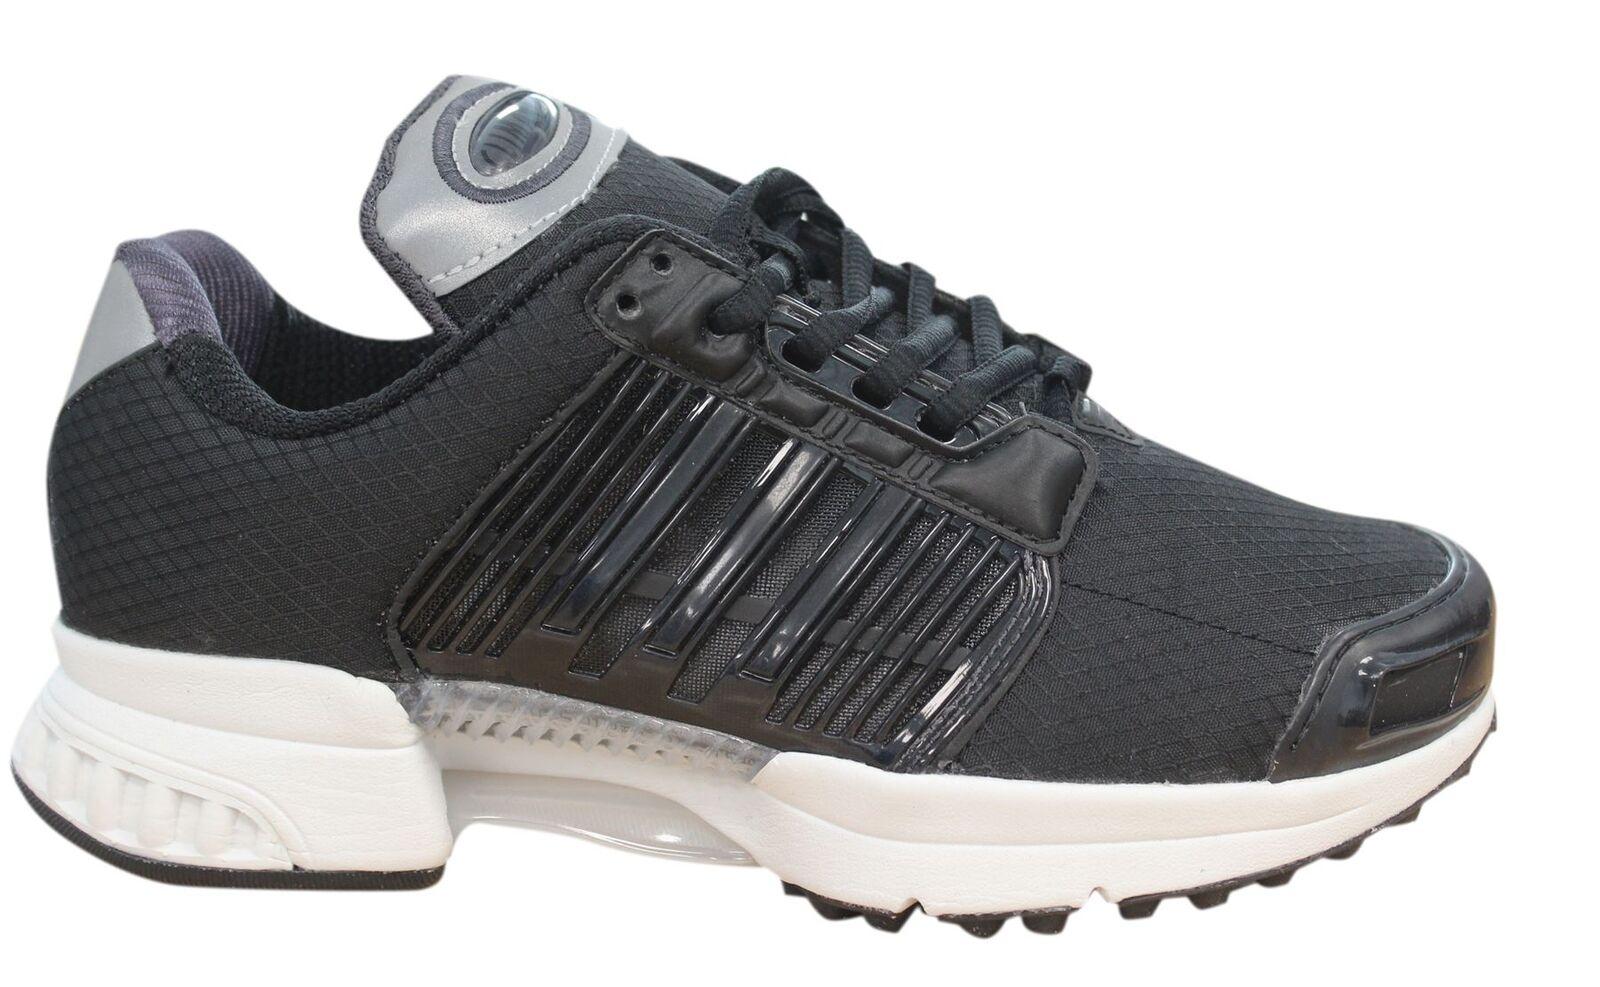 Adidas Originals ClimaCool 1 Lace Up Black Textile Mens Trainers BA7156 D91